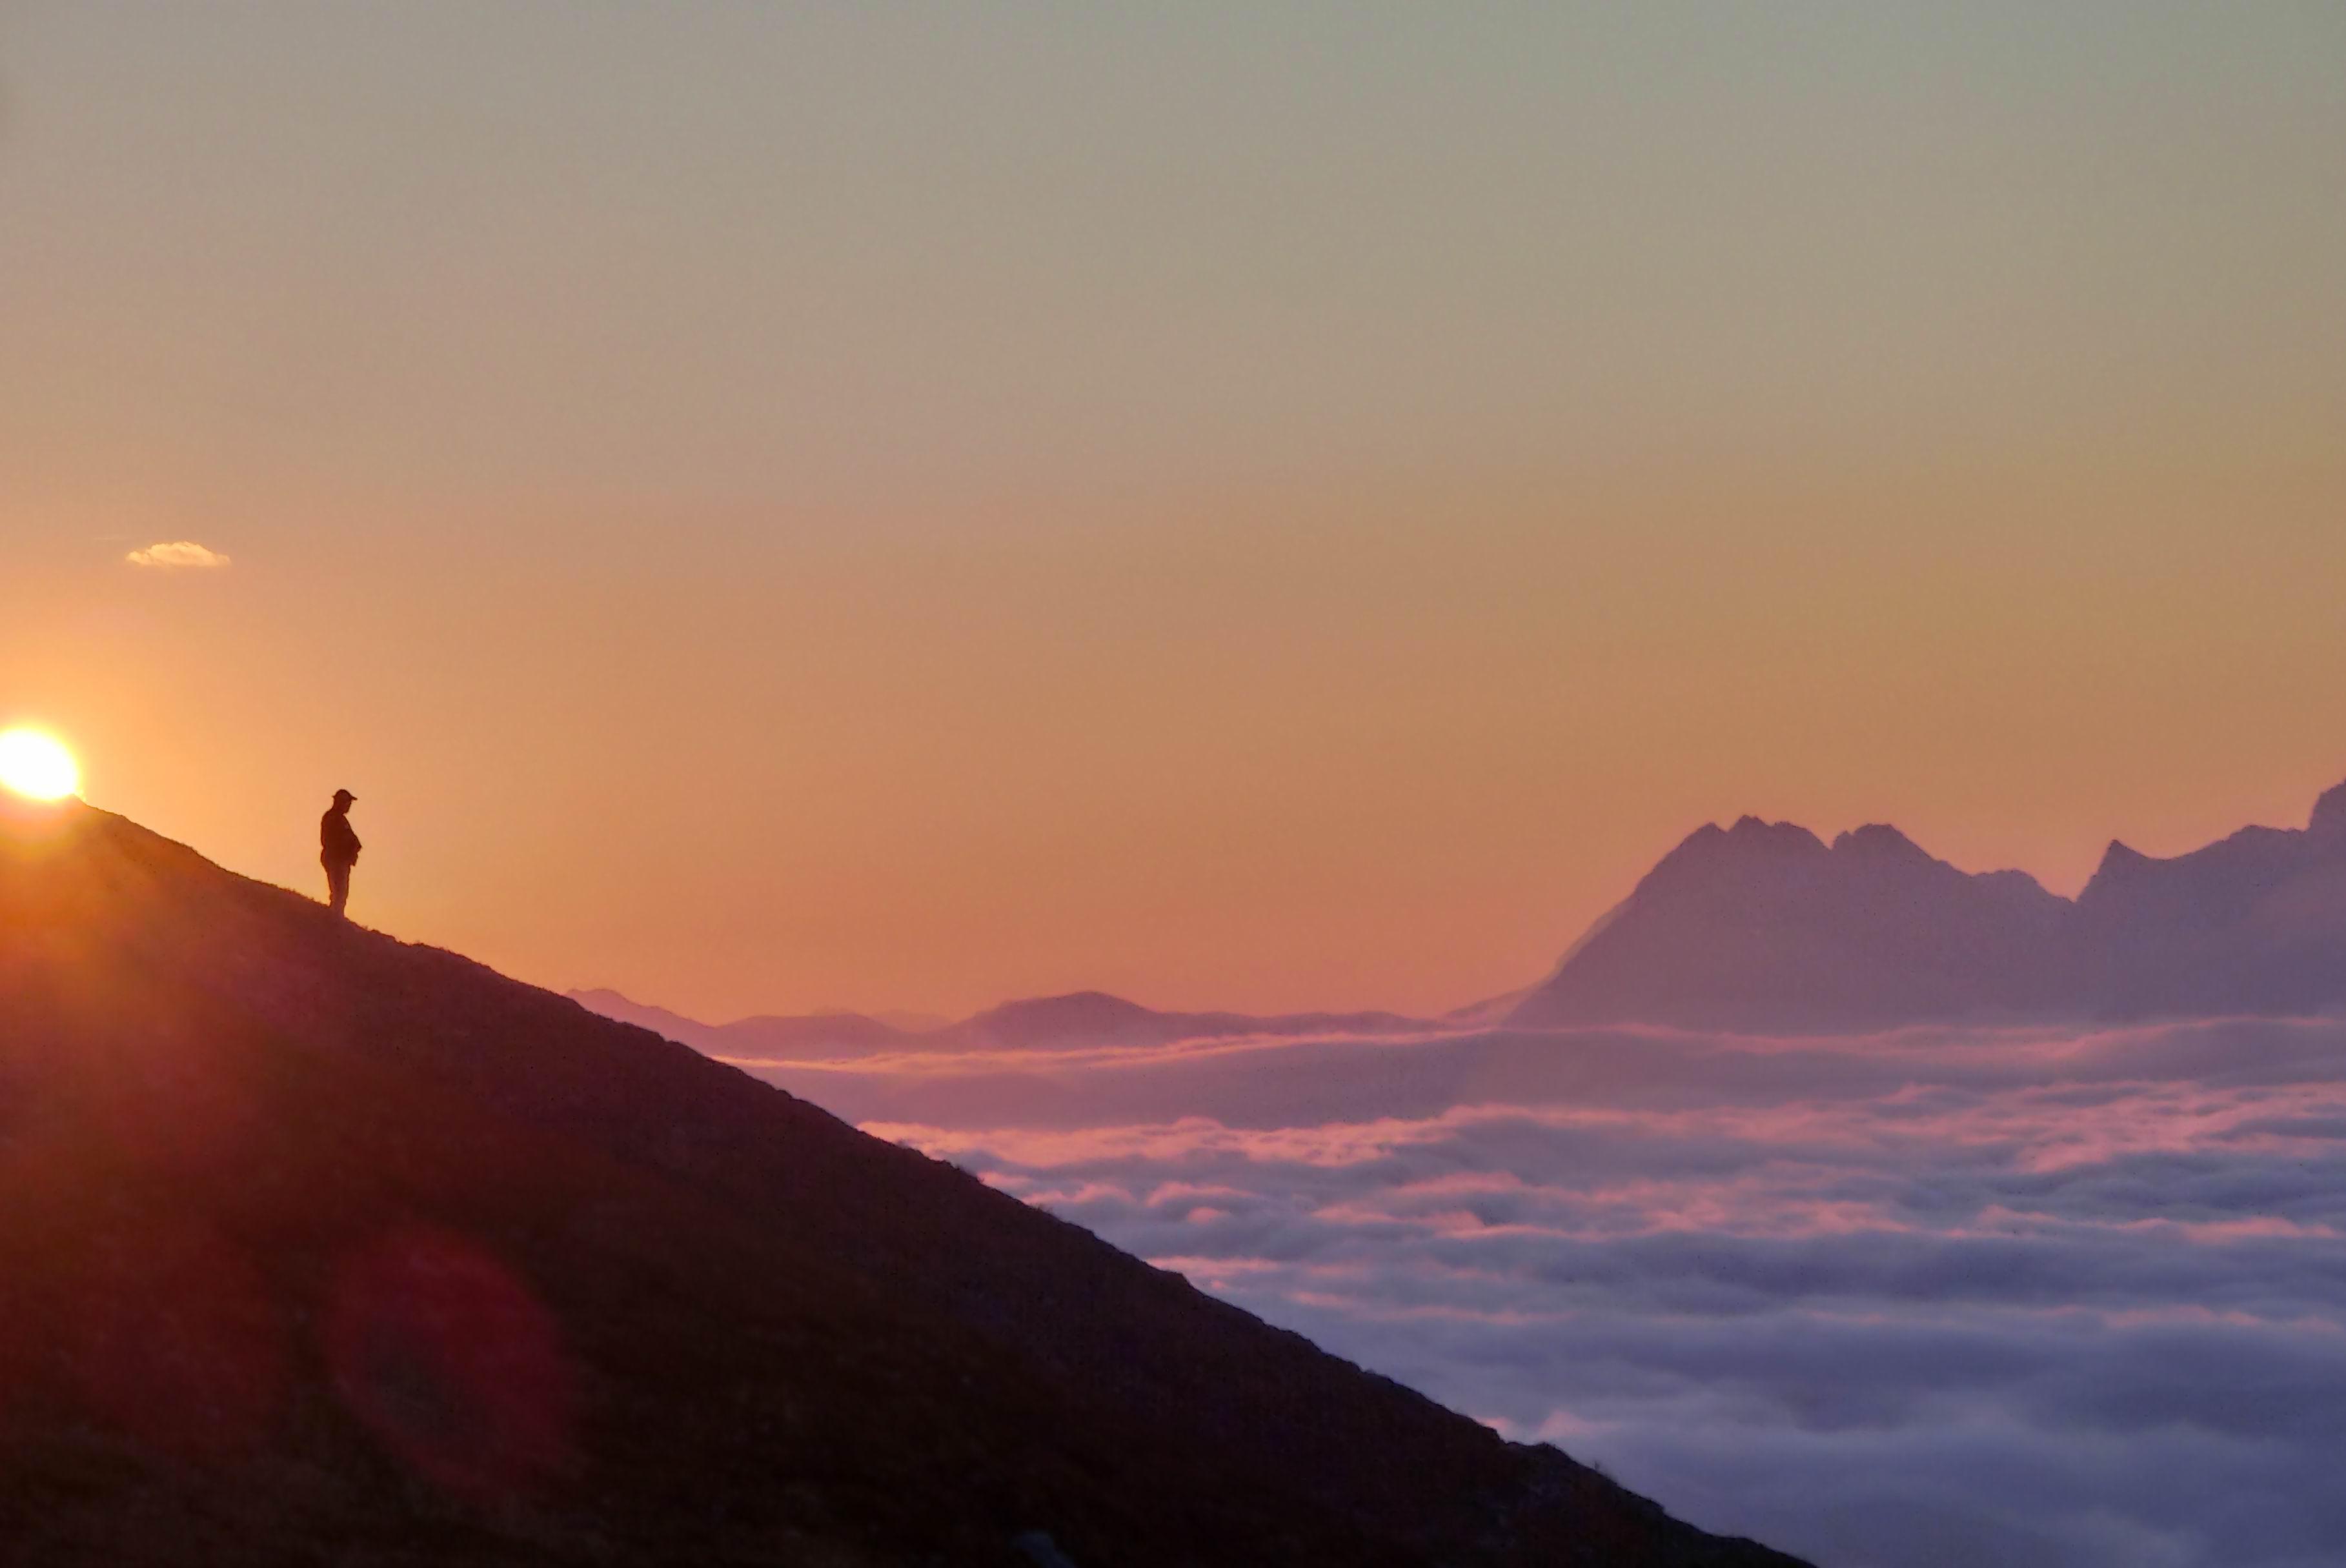 curiosity sunrise sunset times - HD3635×2430